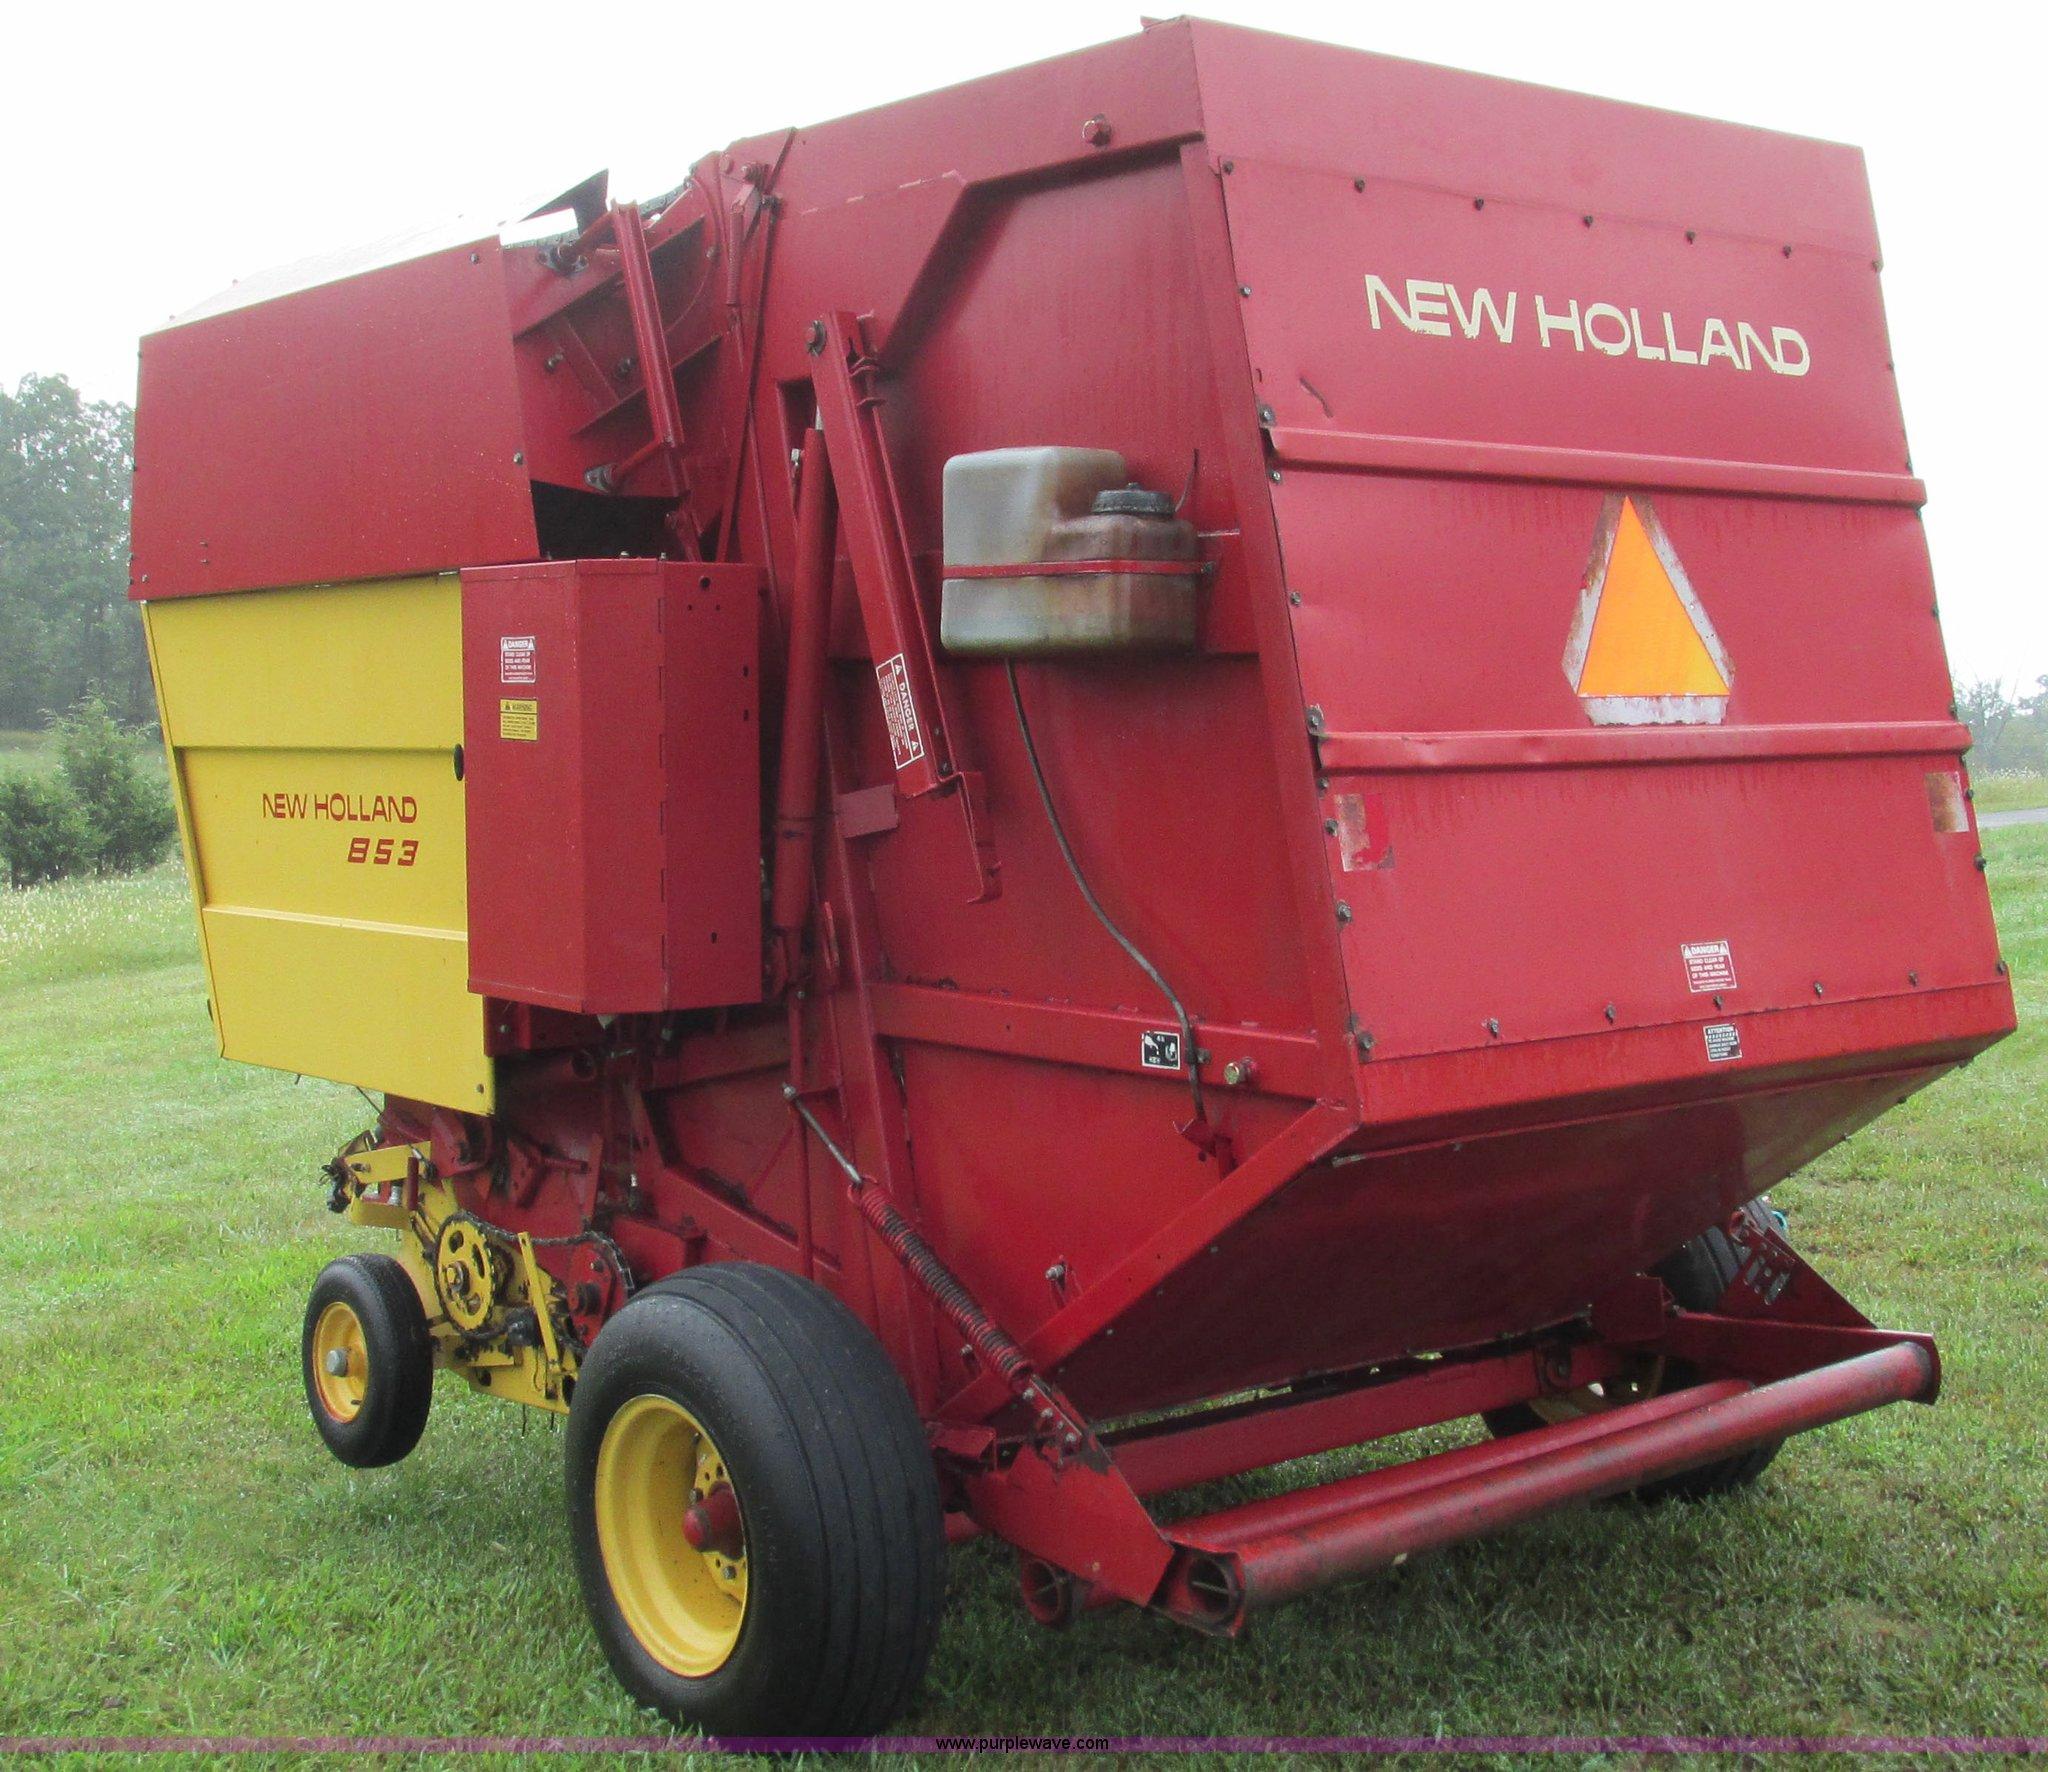 WRG-9303] New Holland 853 Round Baler Operators Manual